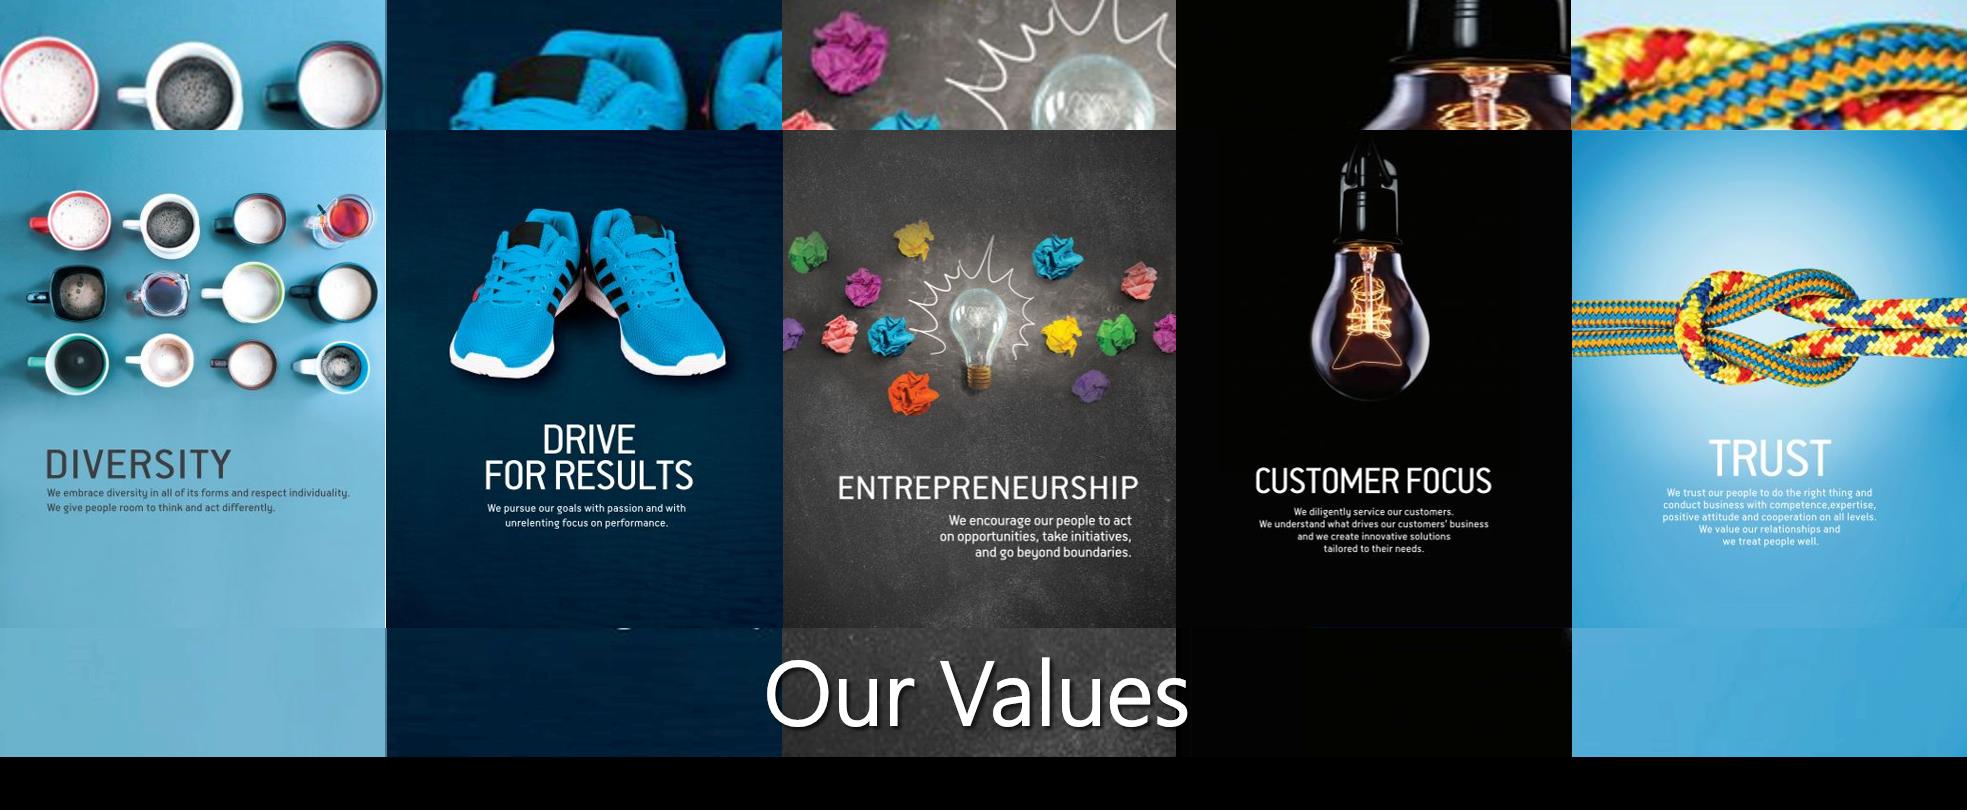 Printec Group Values